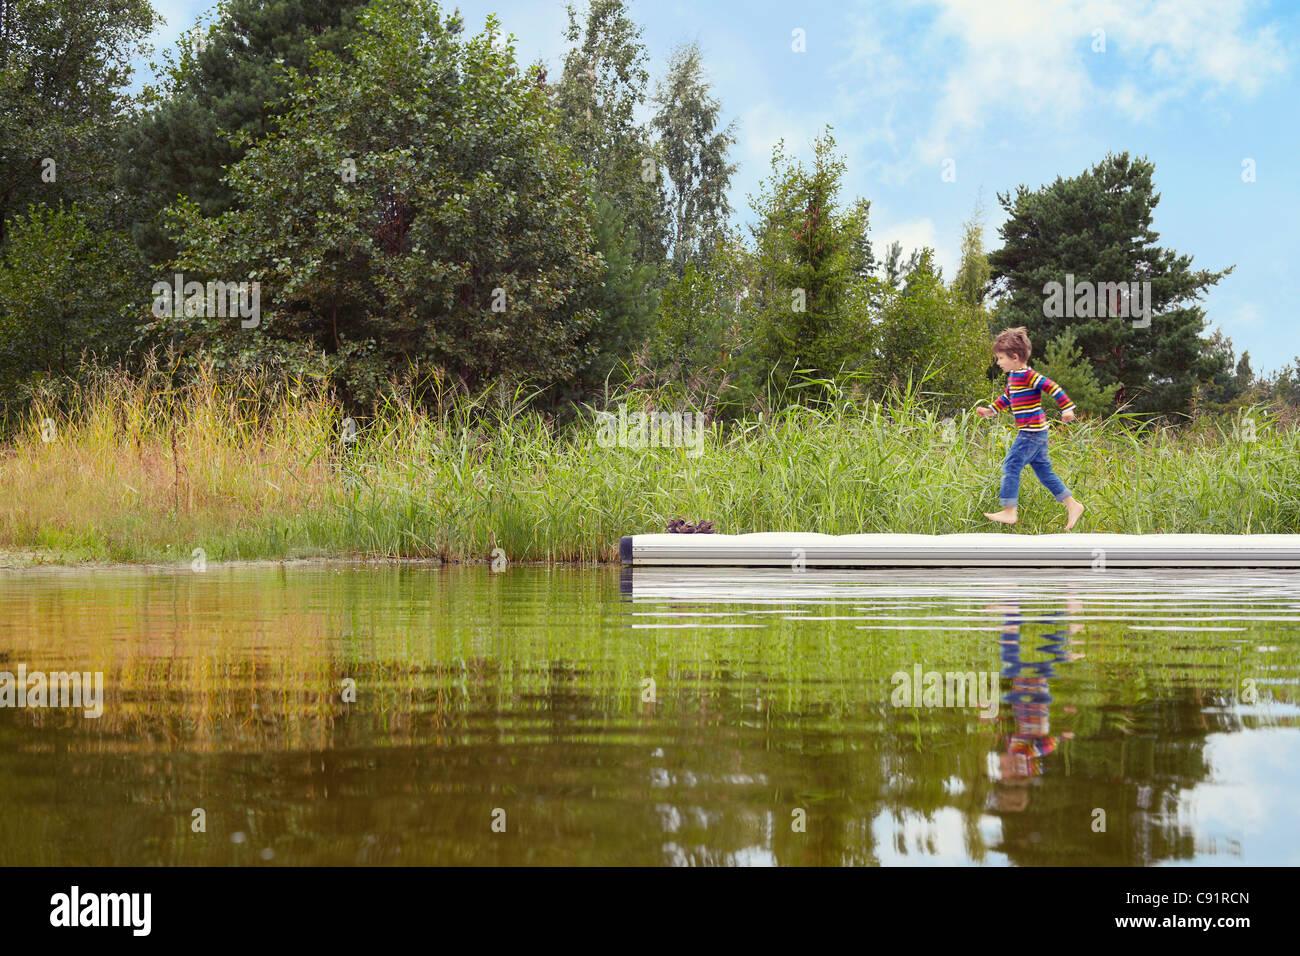 Boy running on wooden pier - Stock Image